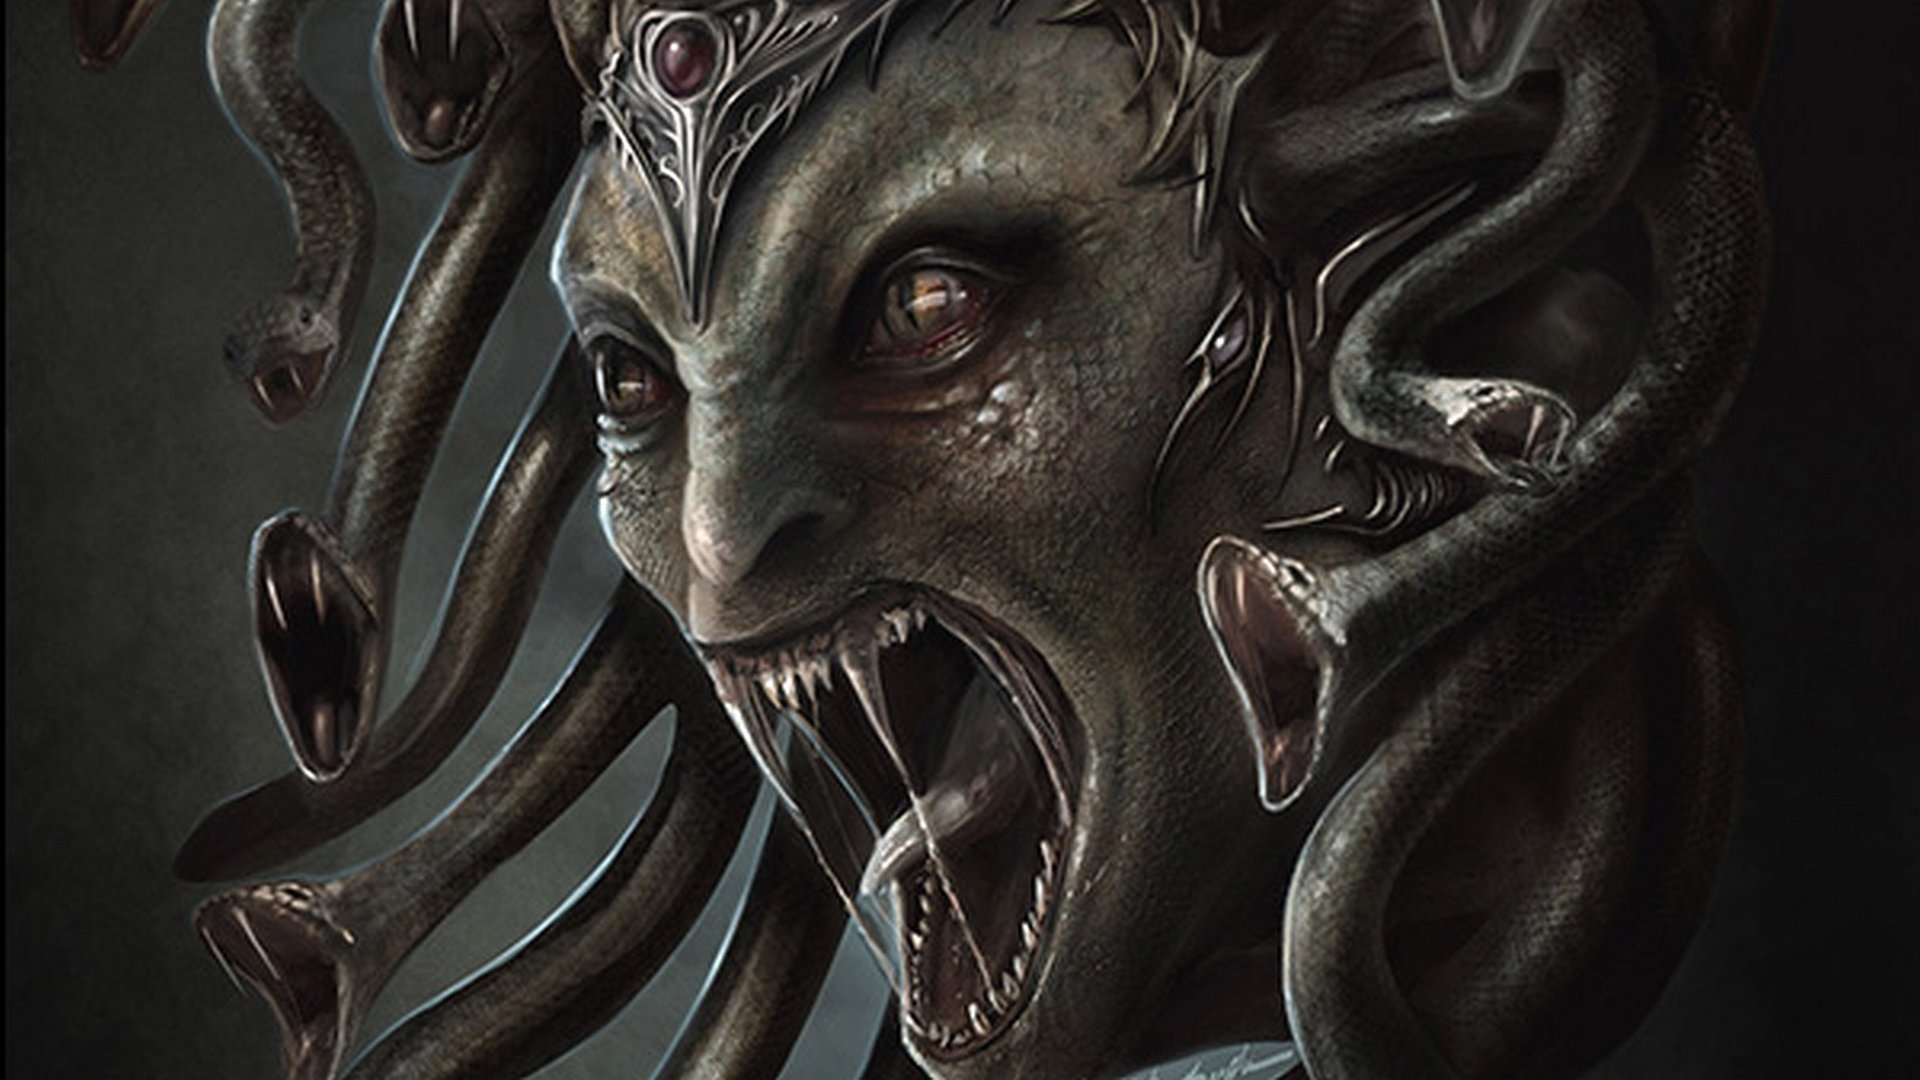 Iphone Wallpaper Maker Medusa Hd Wallpaper Background Image 1920x1080 Id